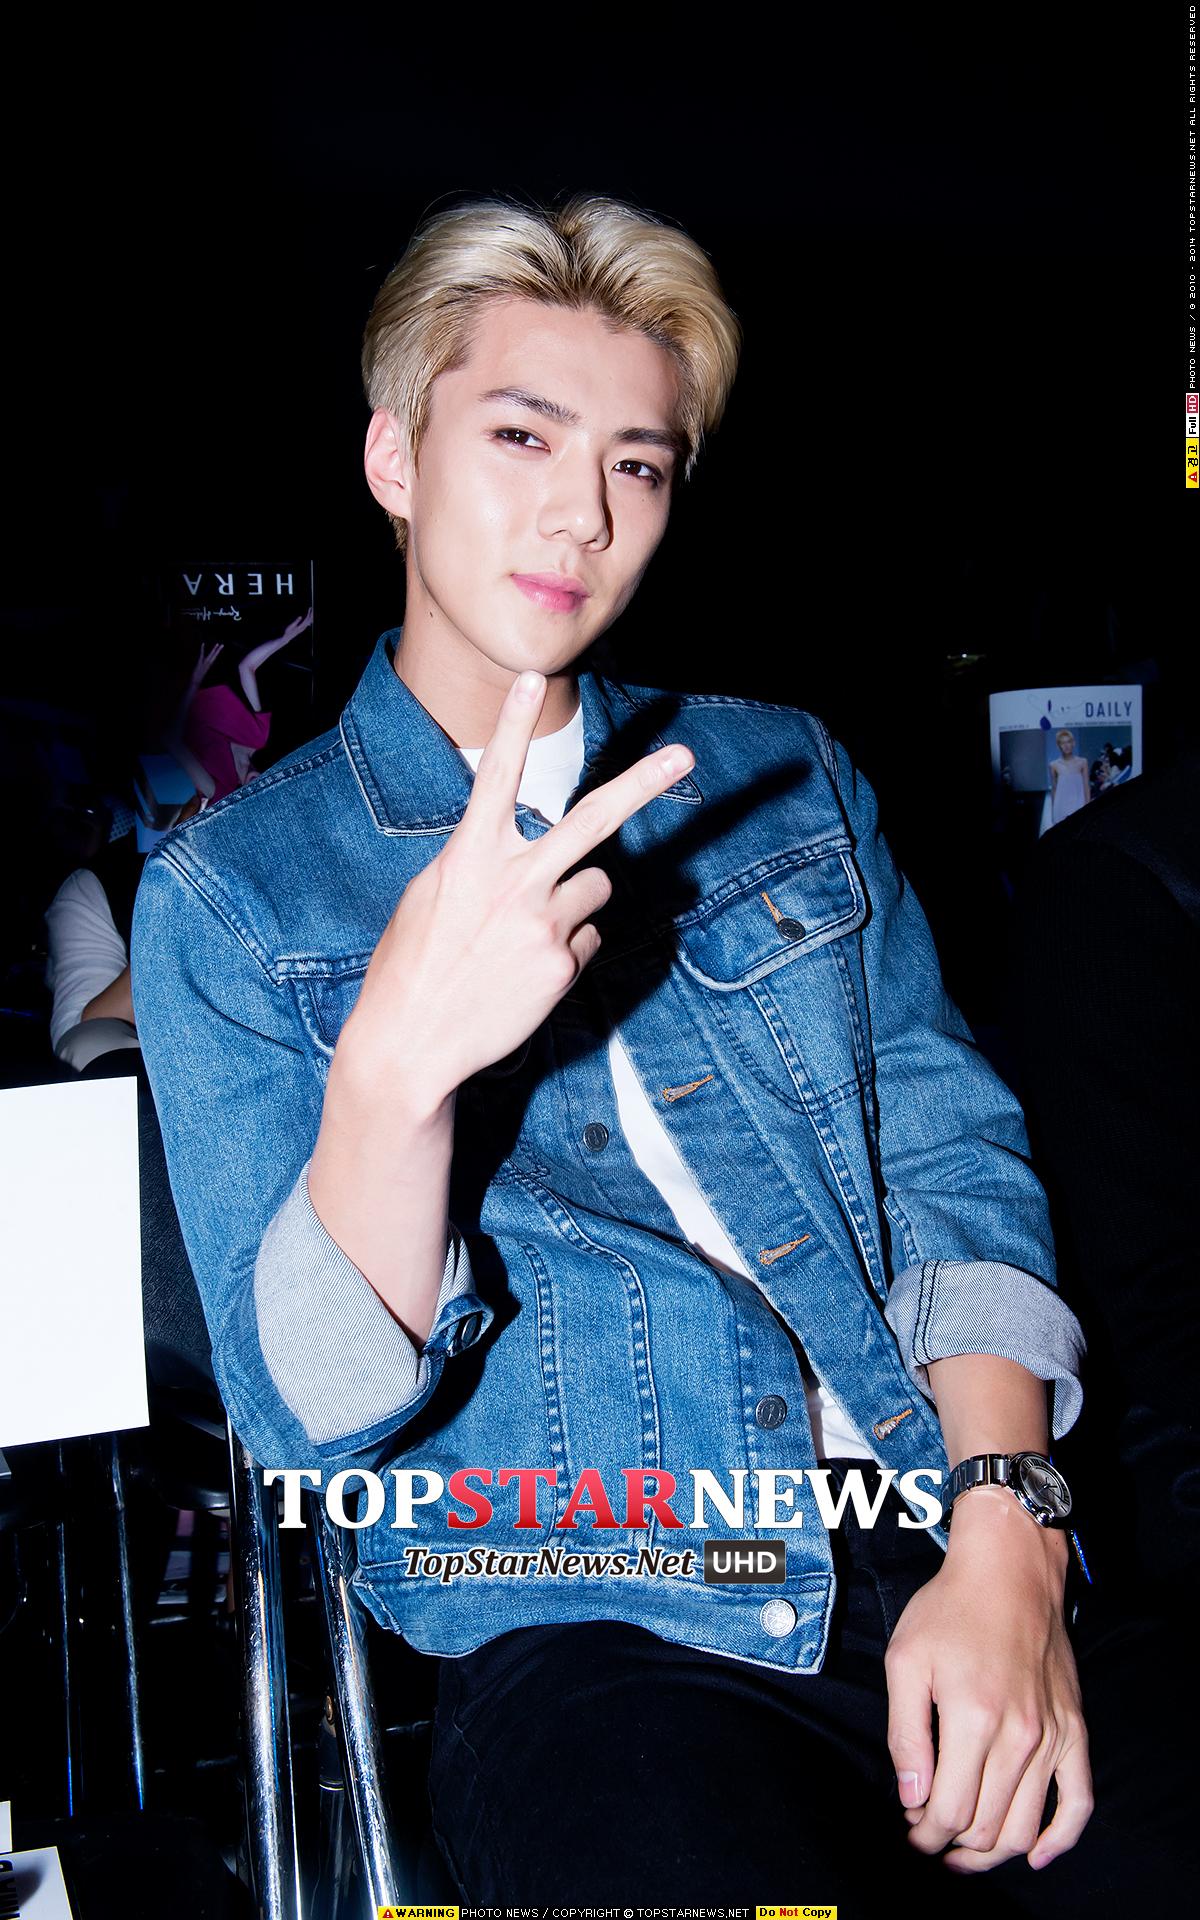 ZZANG ZZANG!猜對了嗎? 就是舉手投足都是畫報的 EXO 成員「世勳」。